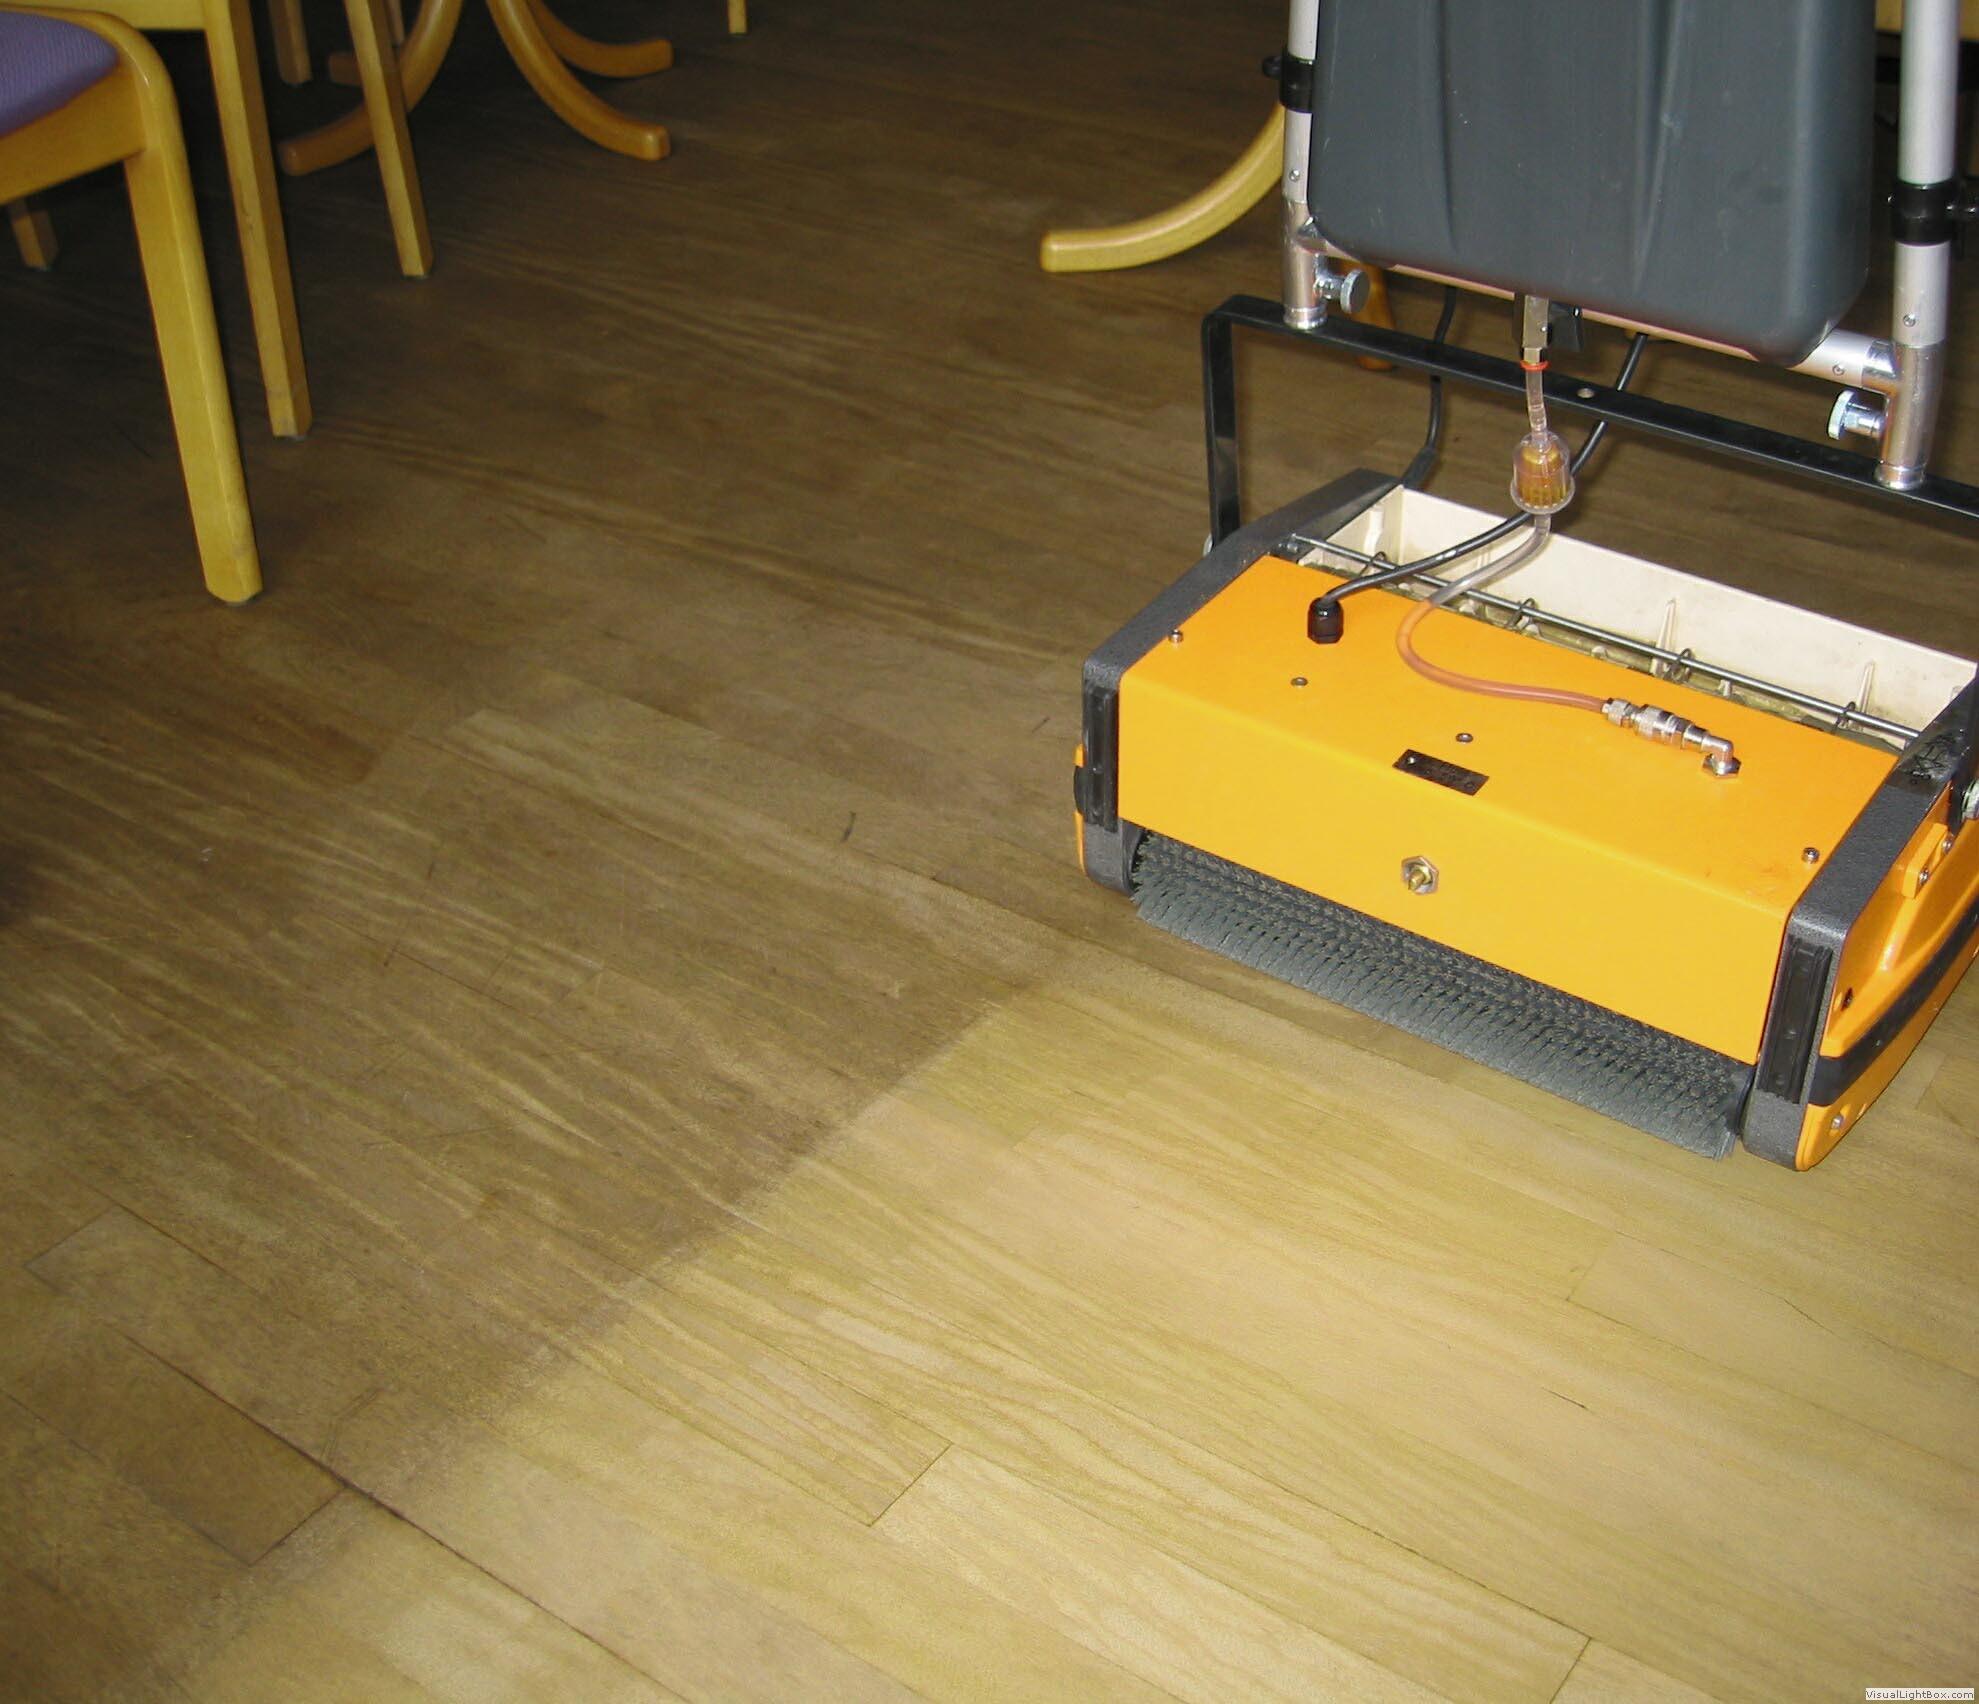 Rotowash Floor Cleaners